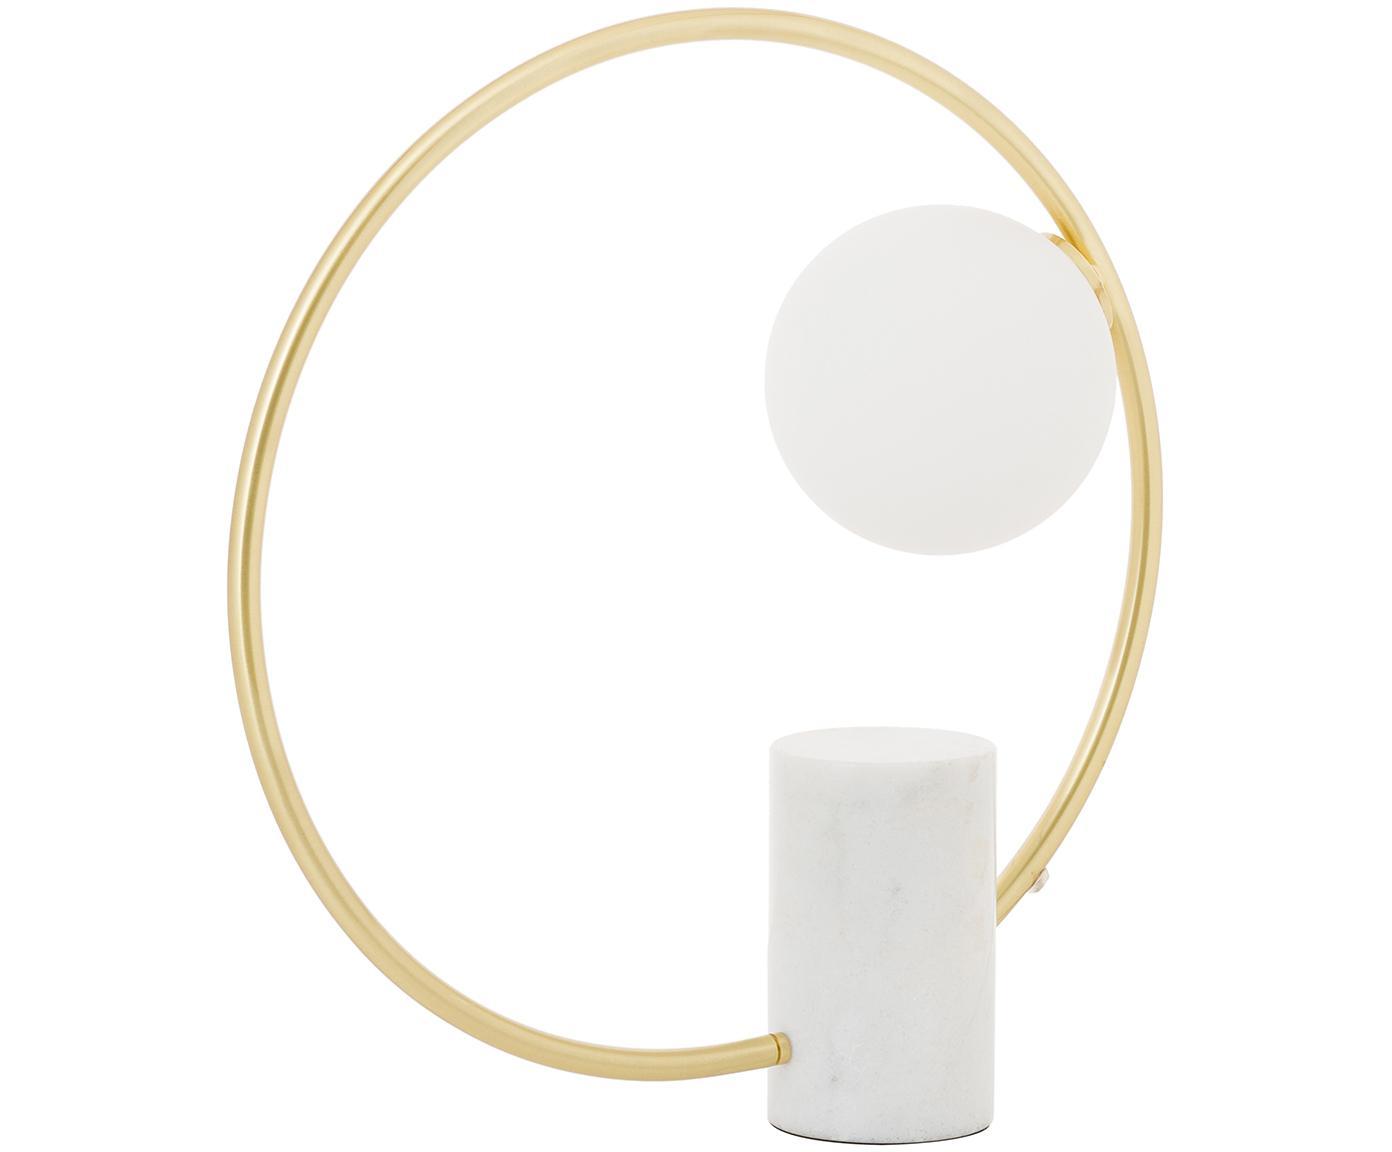 Lámpara de mesa Soho, Pantalla: vidrio, Base de la lámpara: mármol, posibles desviaci, Cable: plástico, Blanco, latón, An 40 x Al 42 cm